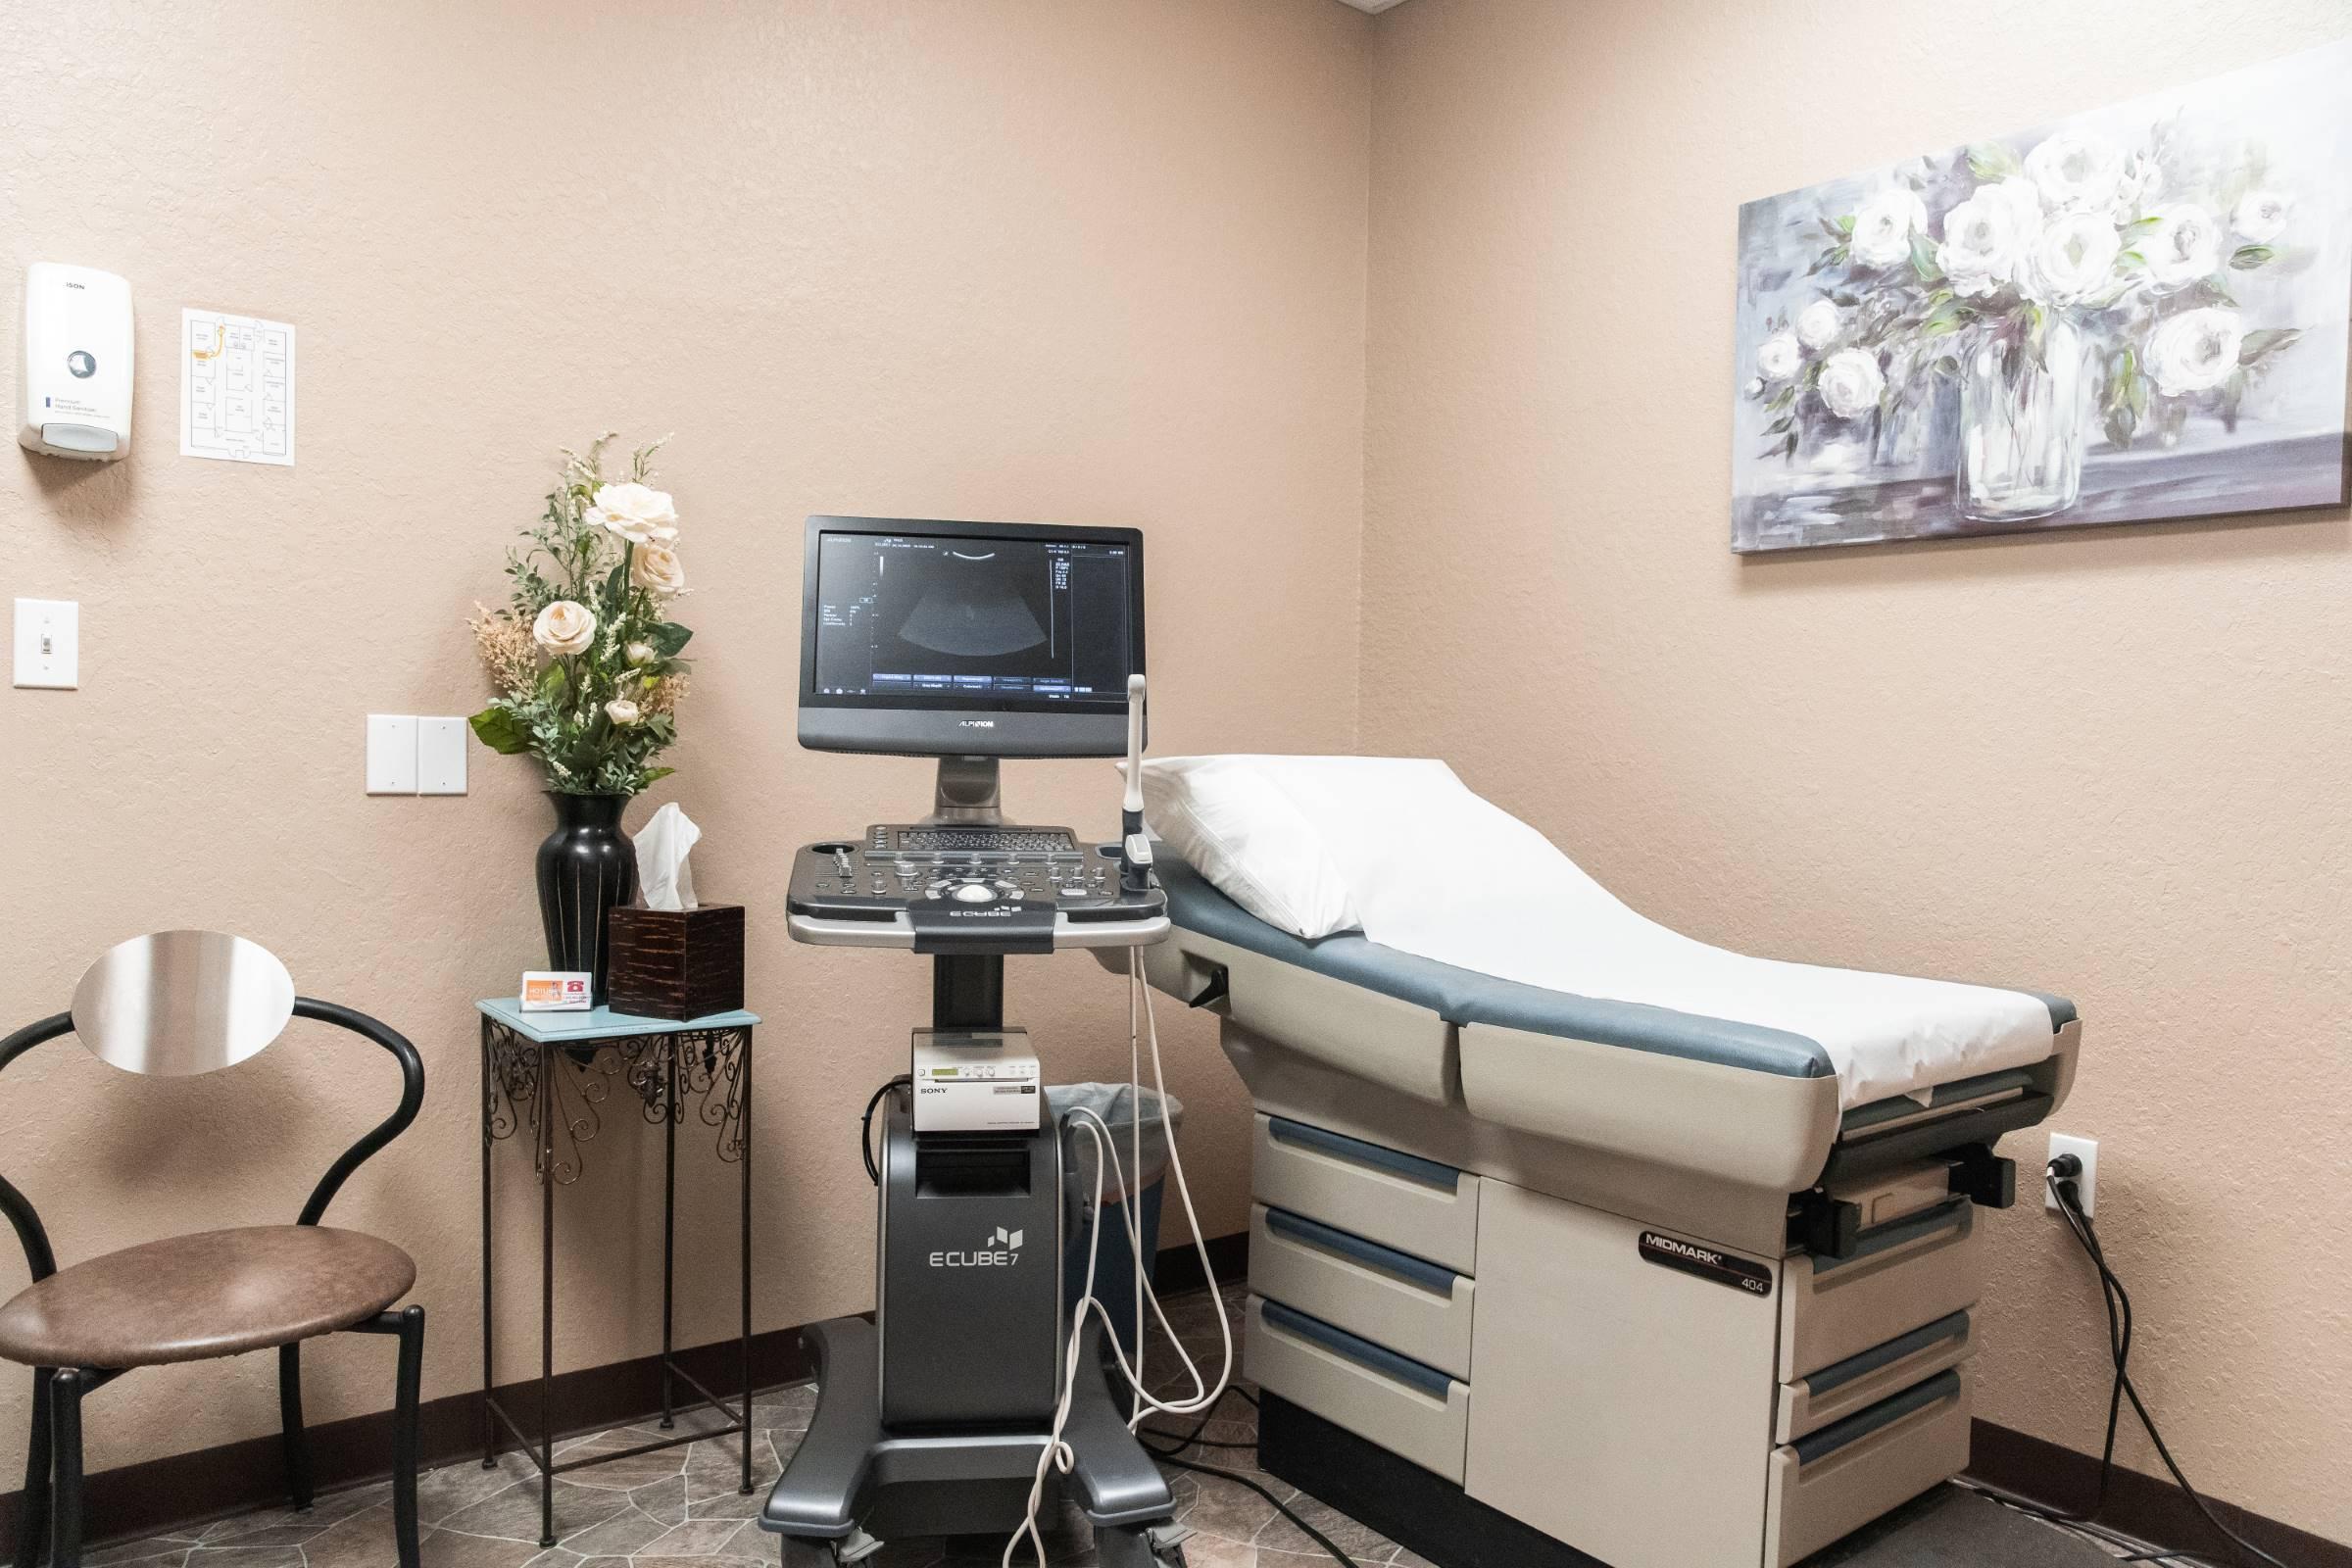 Image for Pregnancy Testing